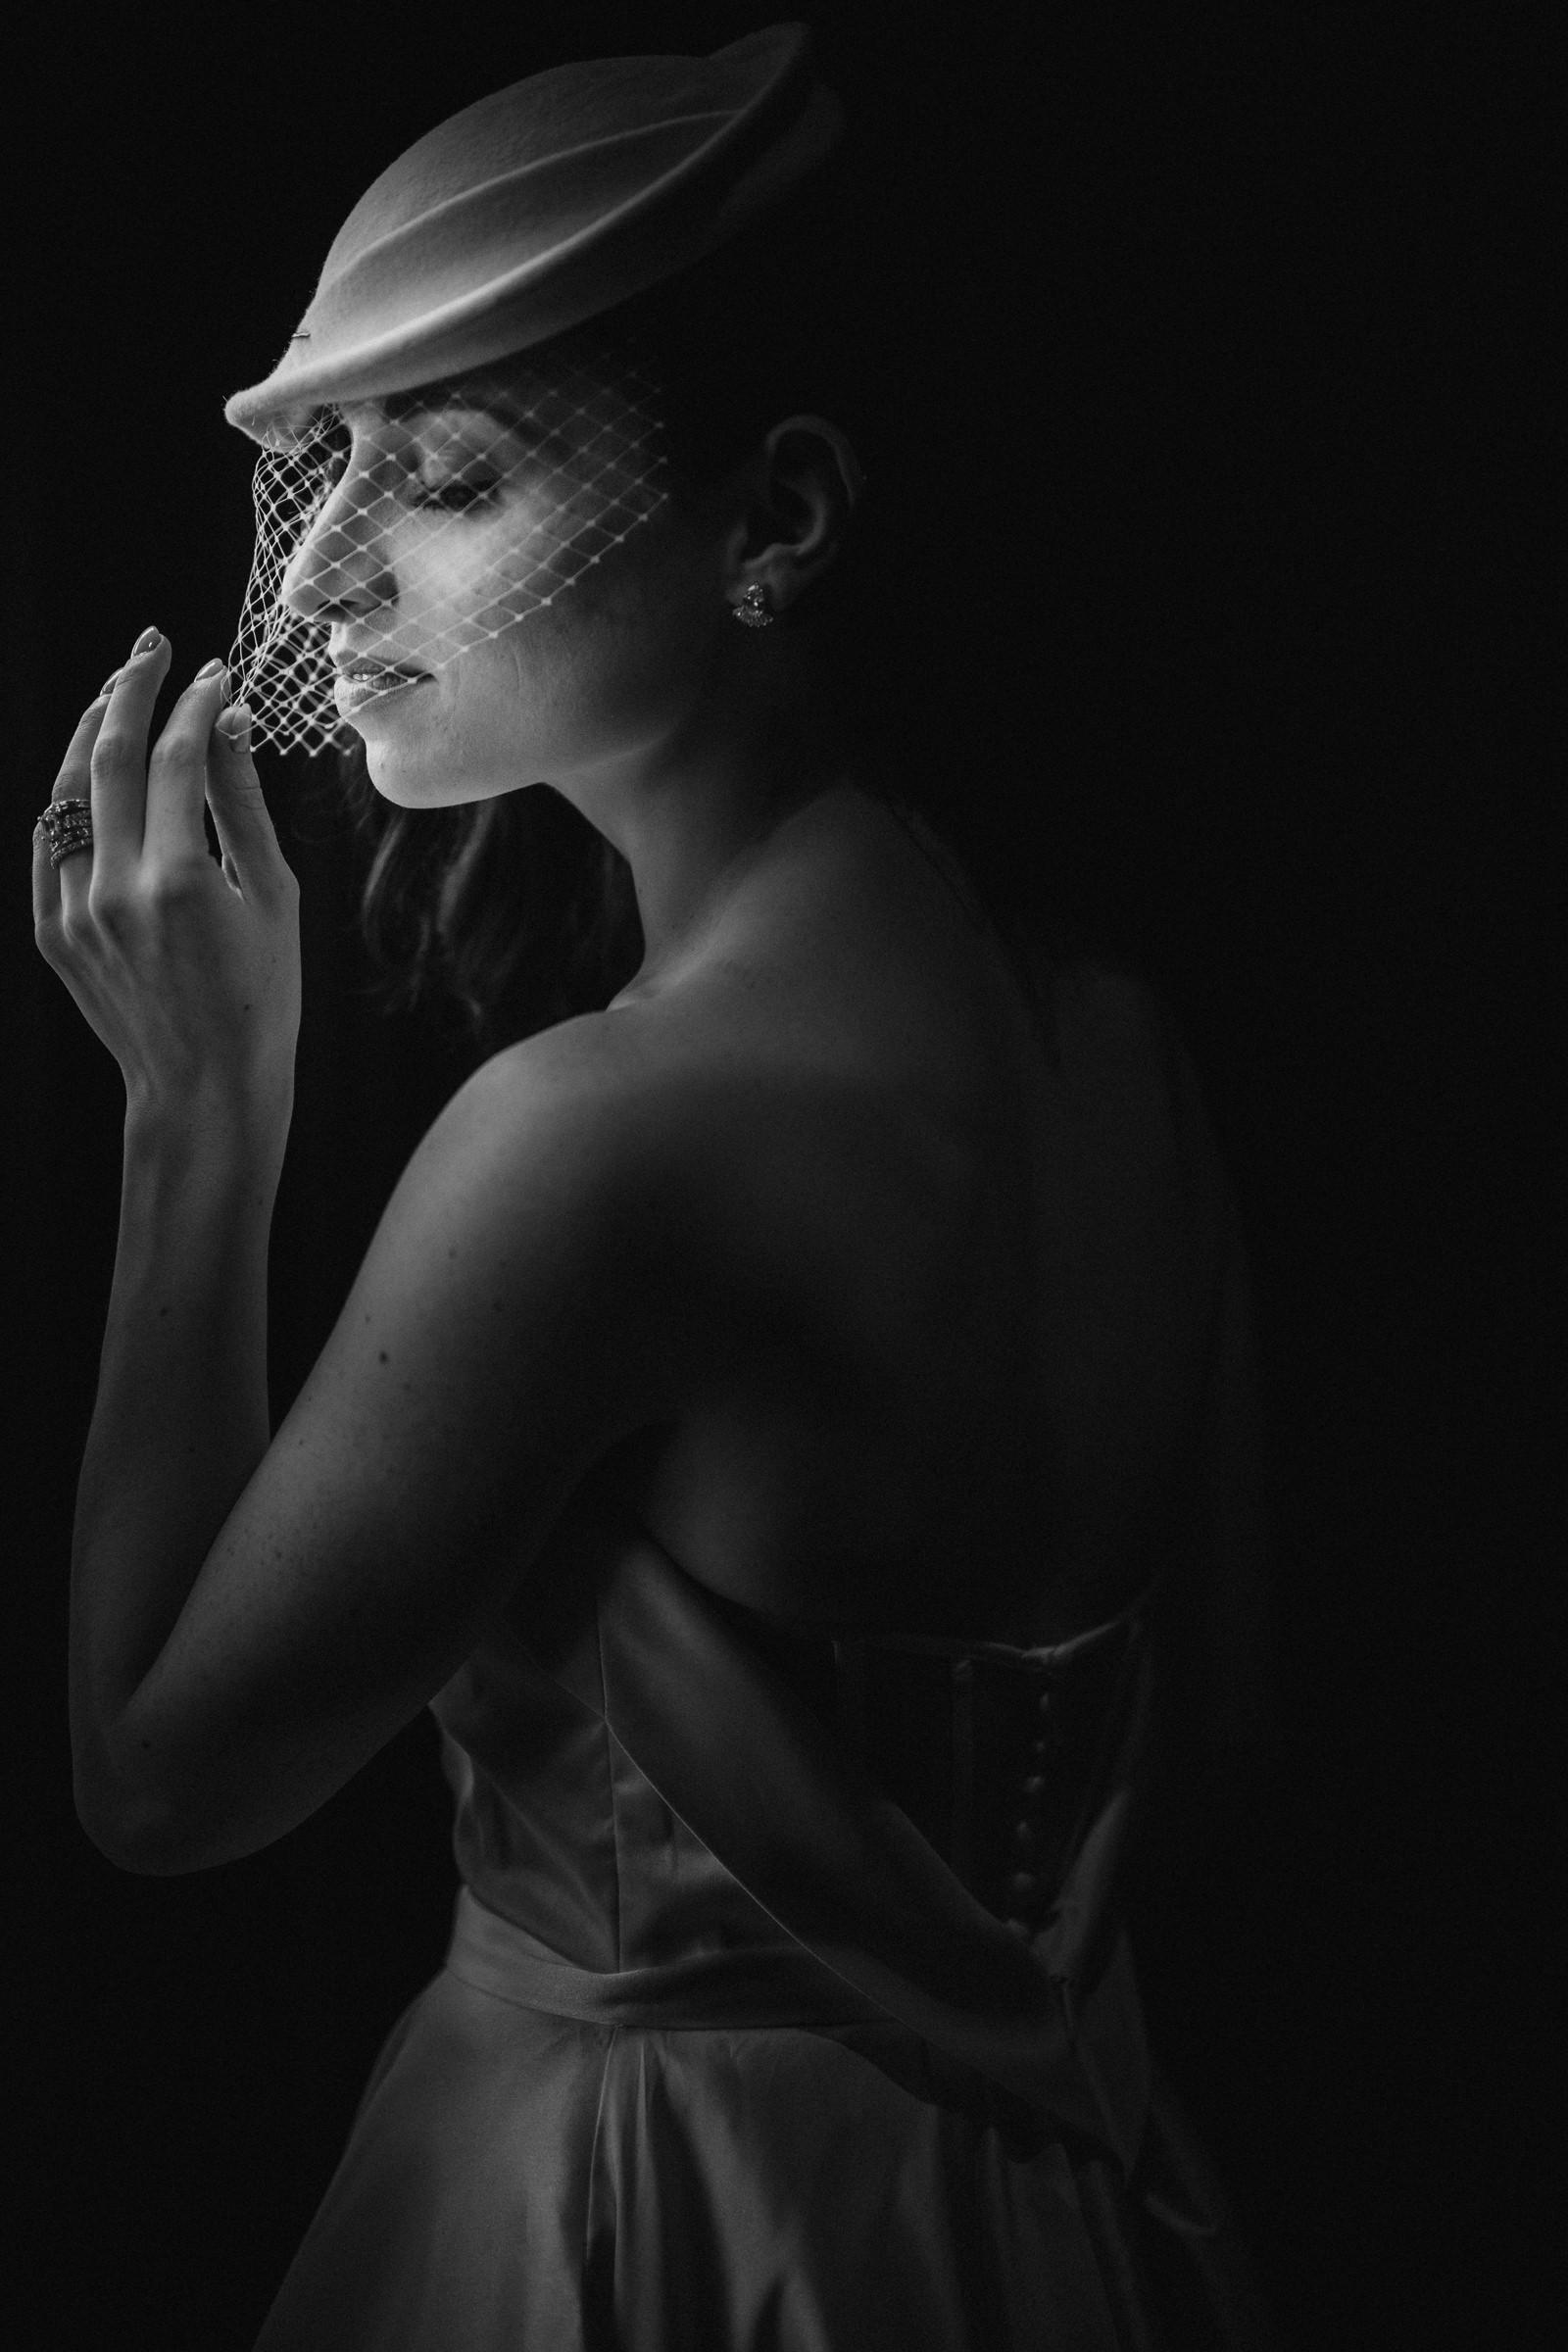 Profile of bride wearing modern birdcage veil - photo by Susan Stripling - New York